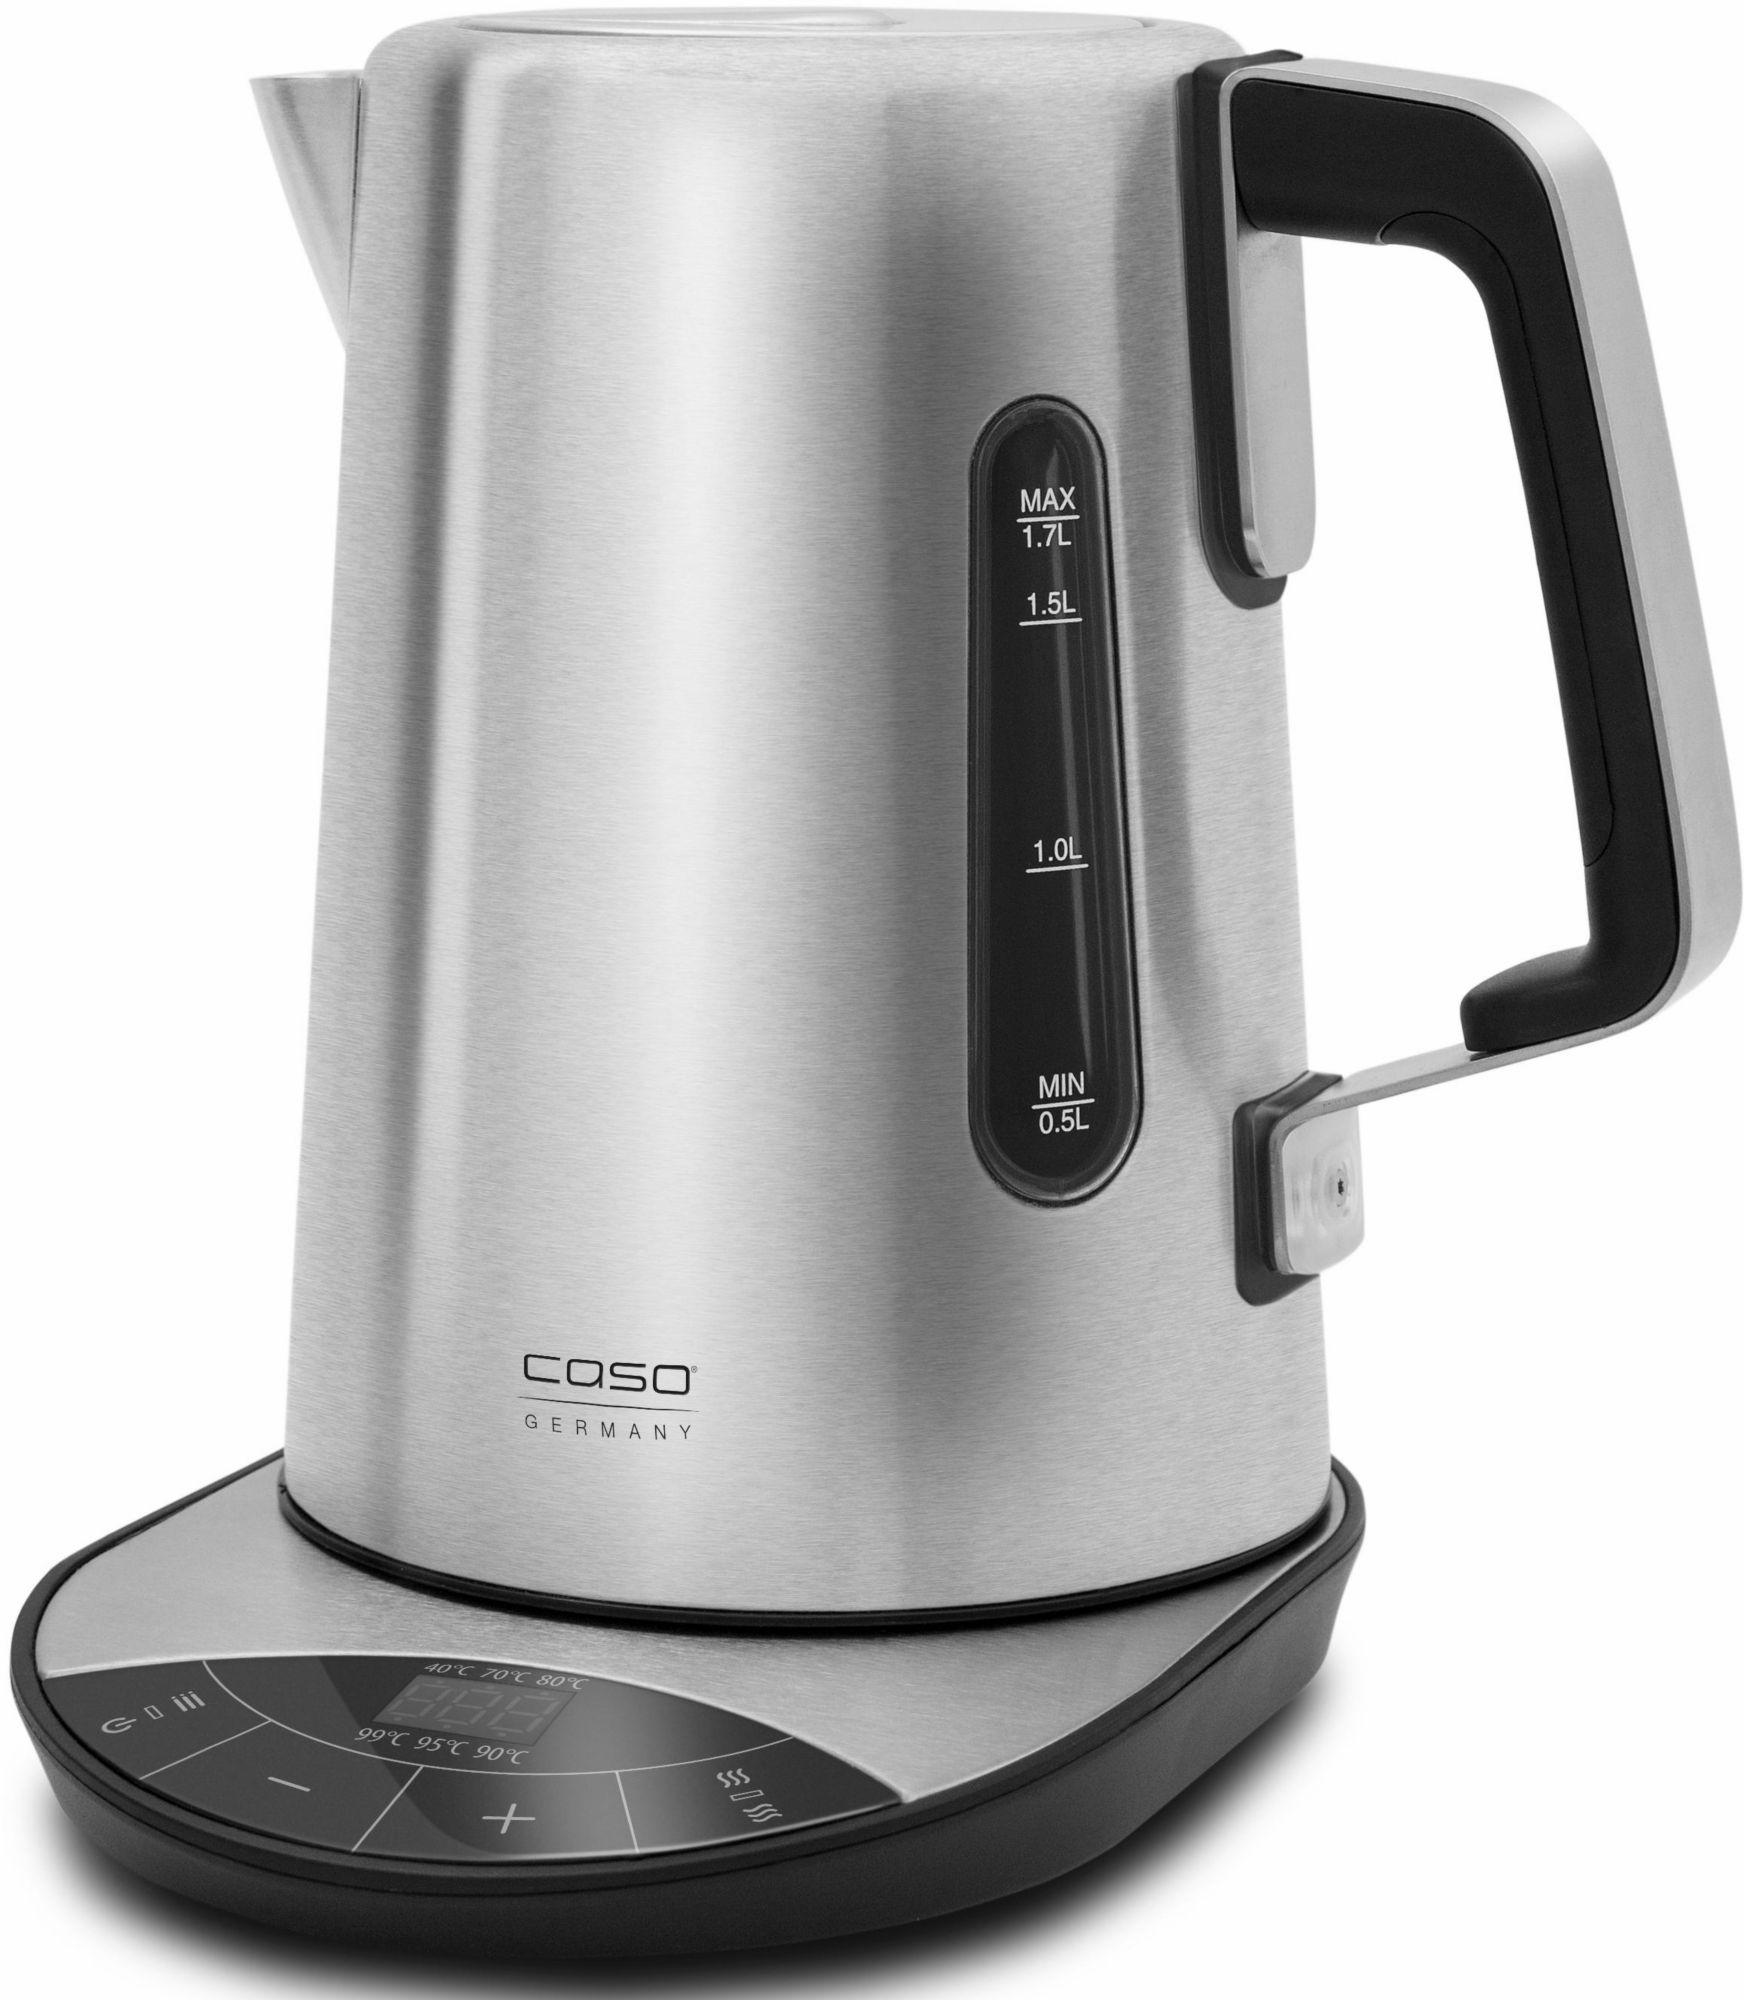 CASO DESIGN CASO Design Wasserkocher CASO WK2500, 1,7 Liter, 2500 Watt